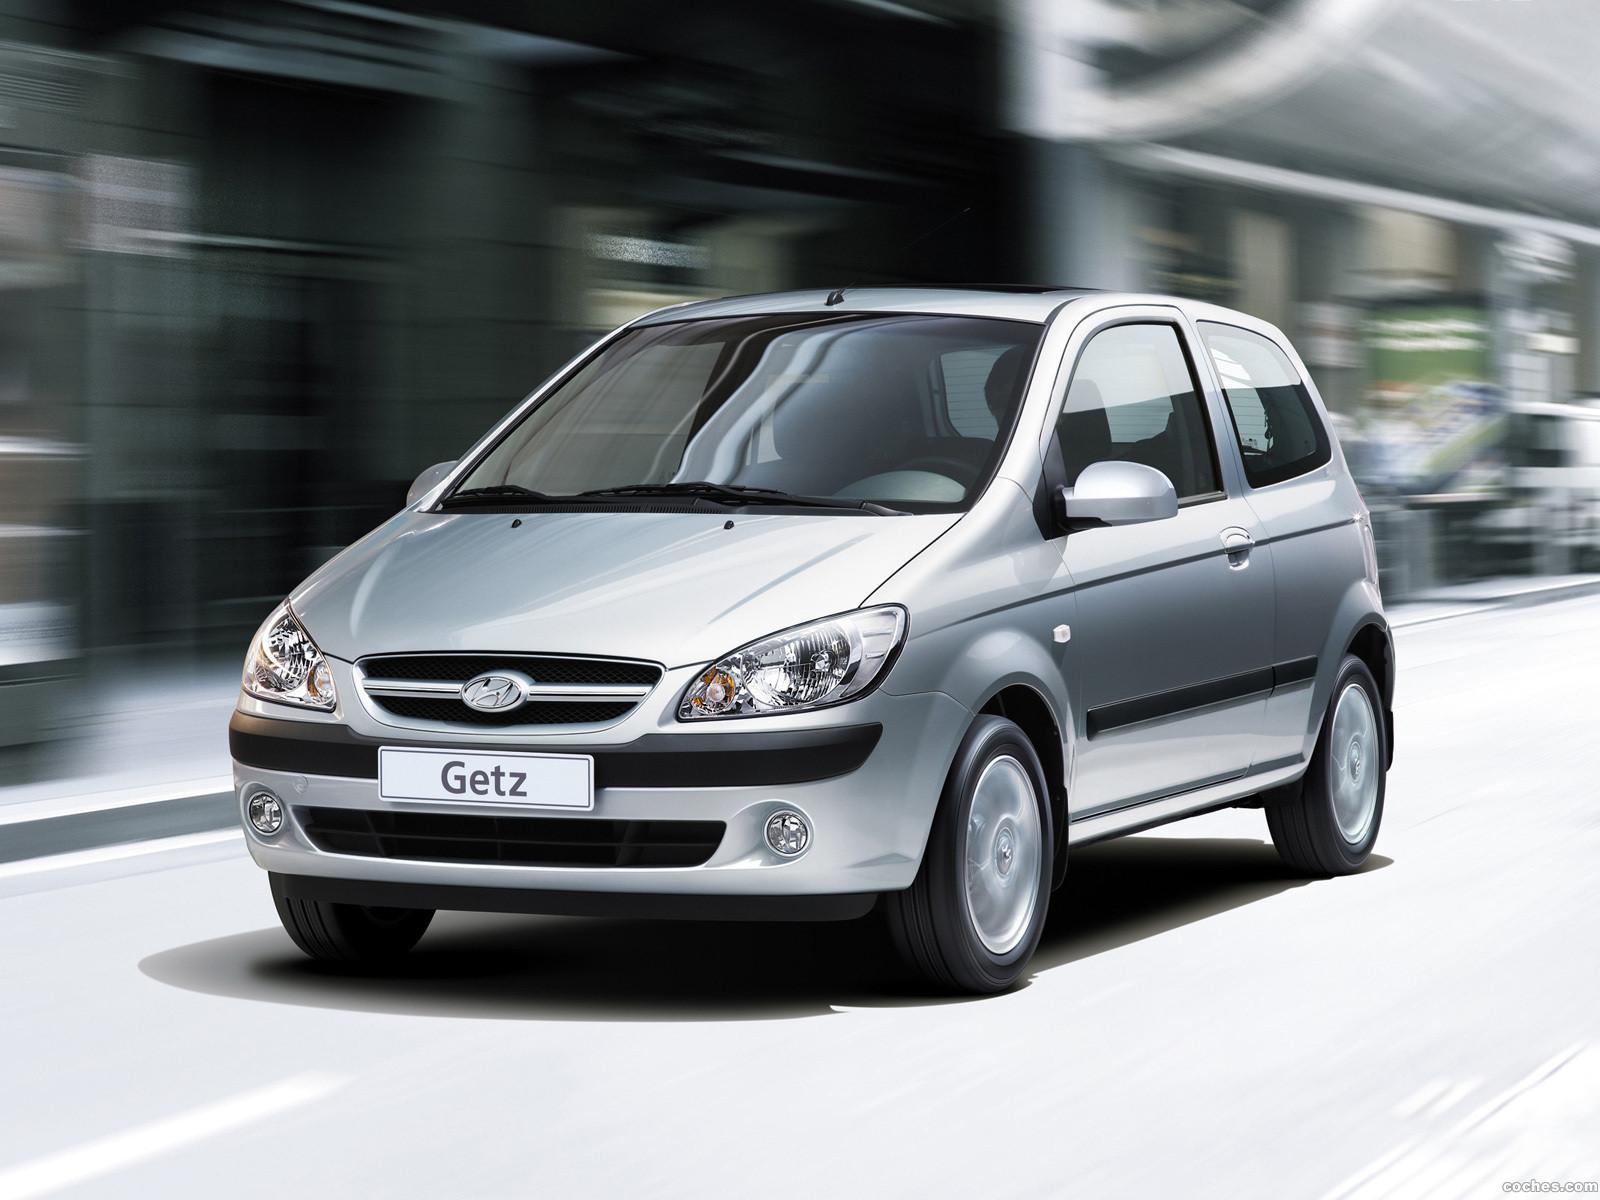 Foto 0 de Hyundai Getz 2006